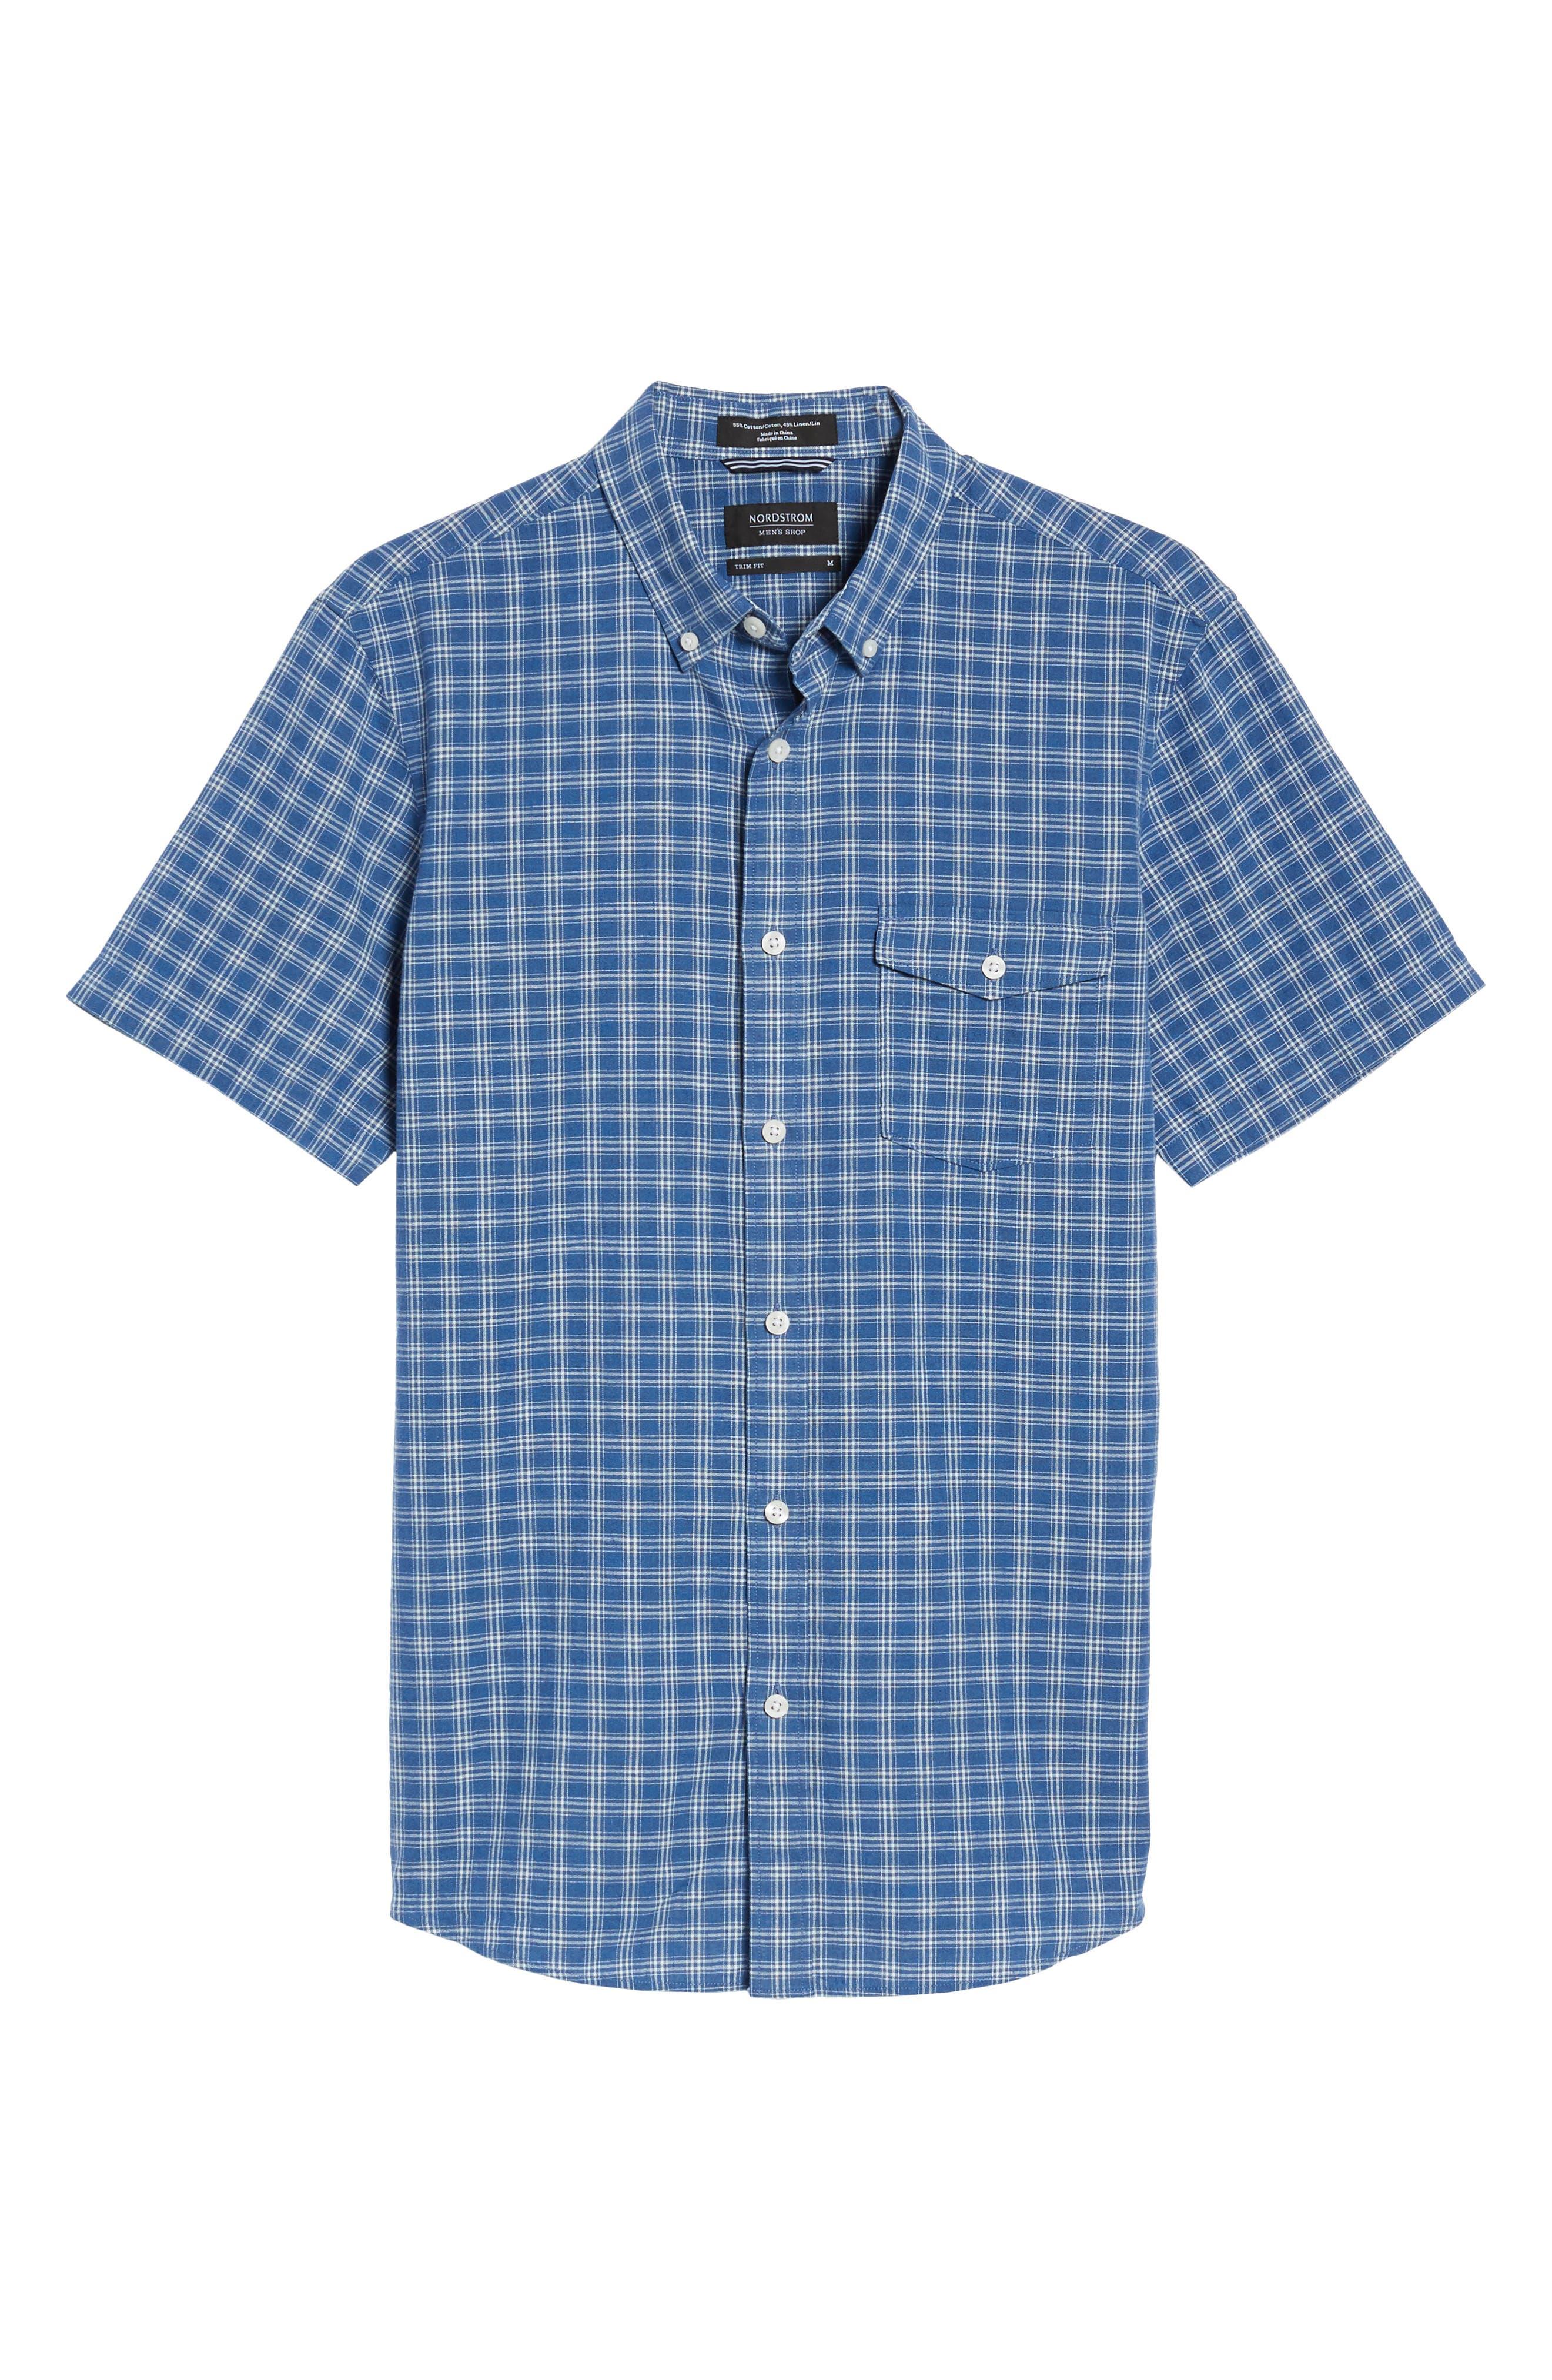 Ivy Trim Fit Check Sport Shirt,                             Alternate thumbnail 6, color,                             Blue Indigo White Plaid